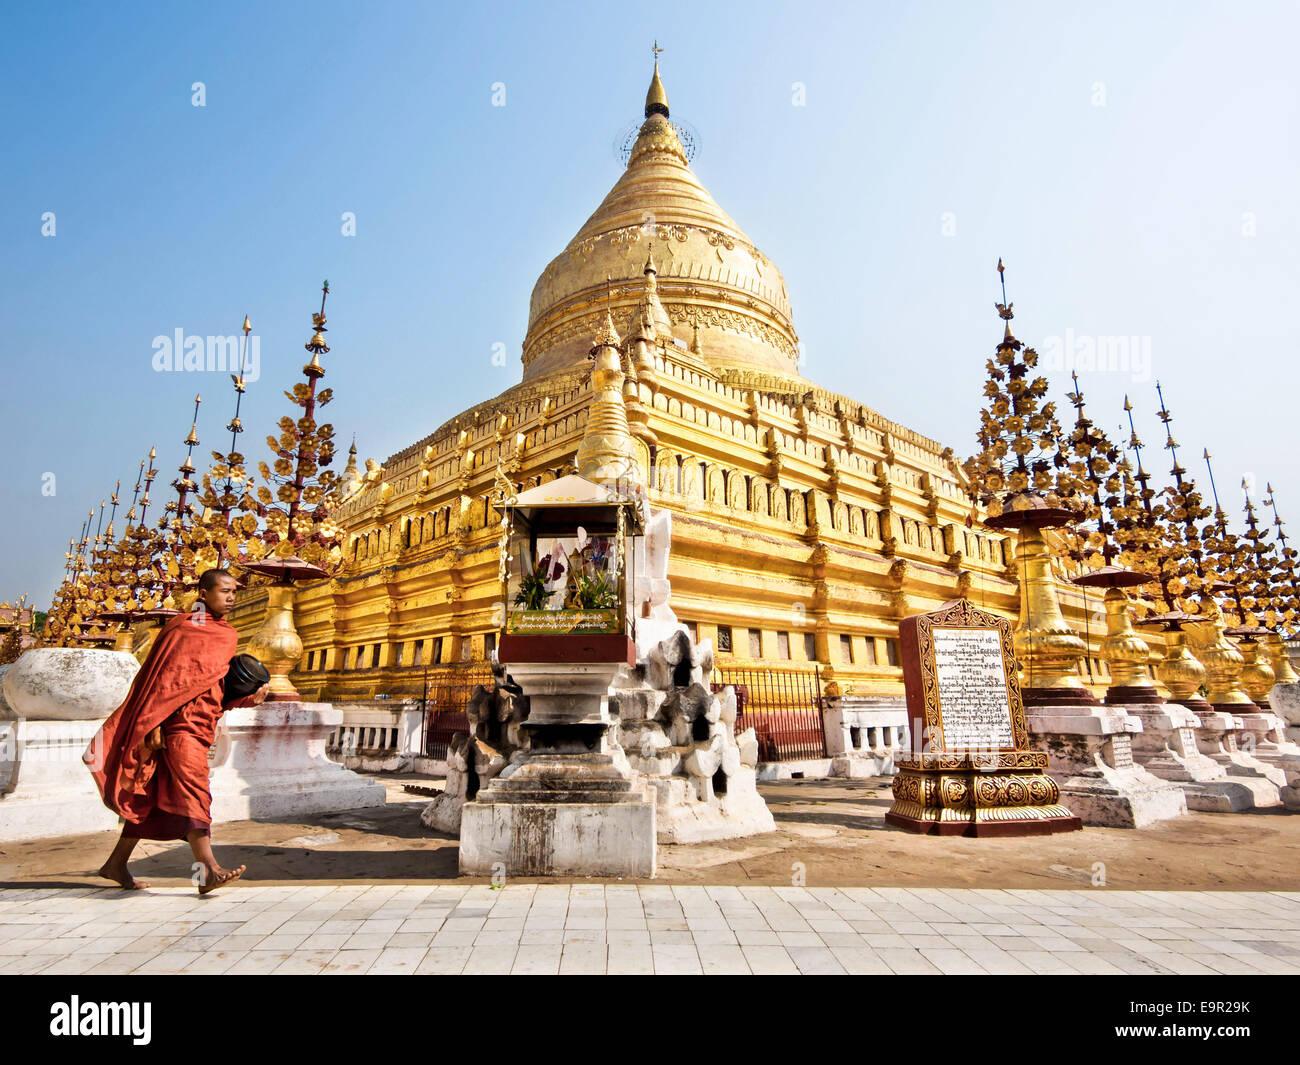 A Buddhist monk walking around sacred Shwezigon Paya, one of Myanmar's most revered pagodas, in Bagan, Myanmar - Stock Image